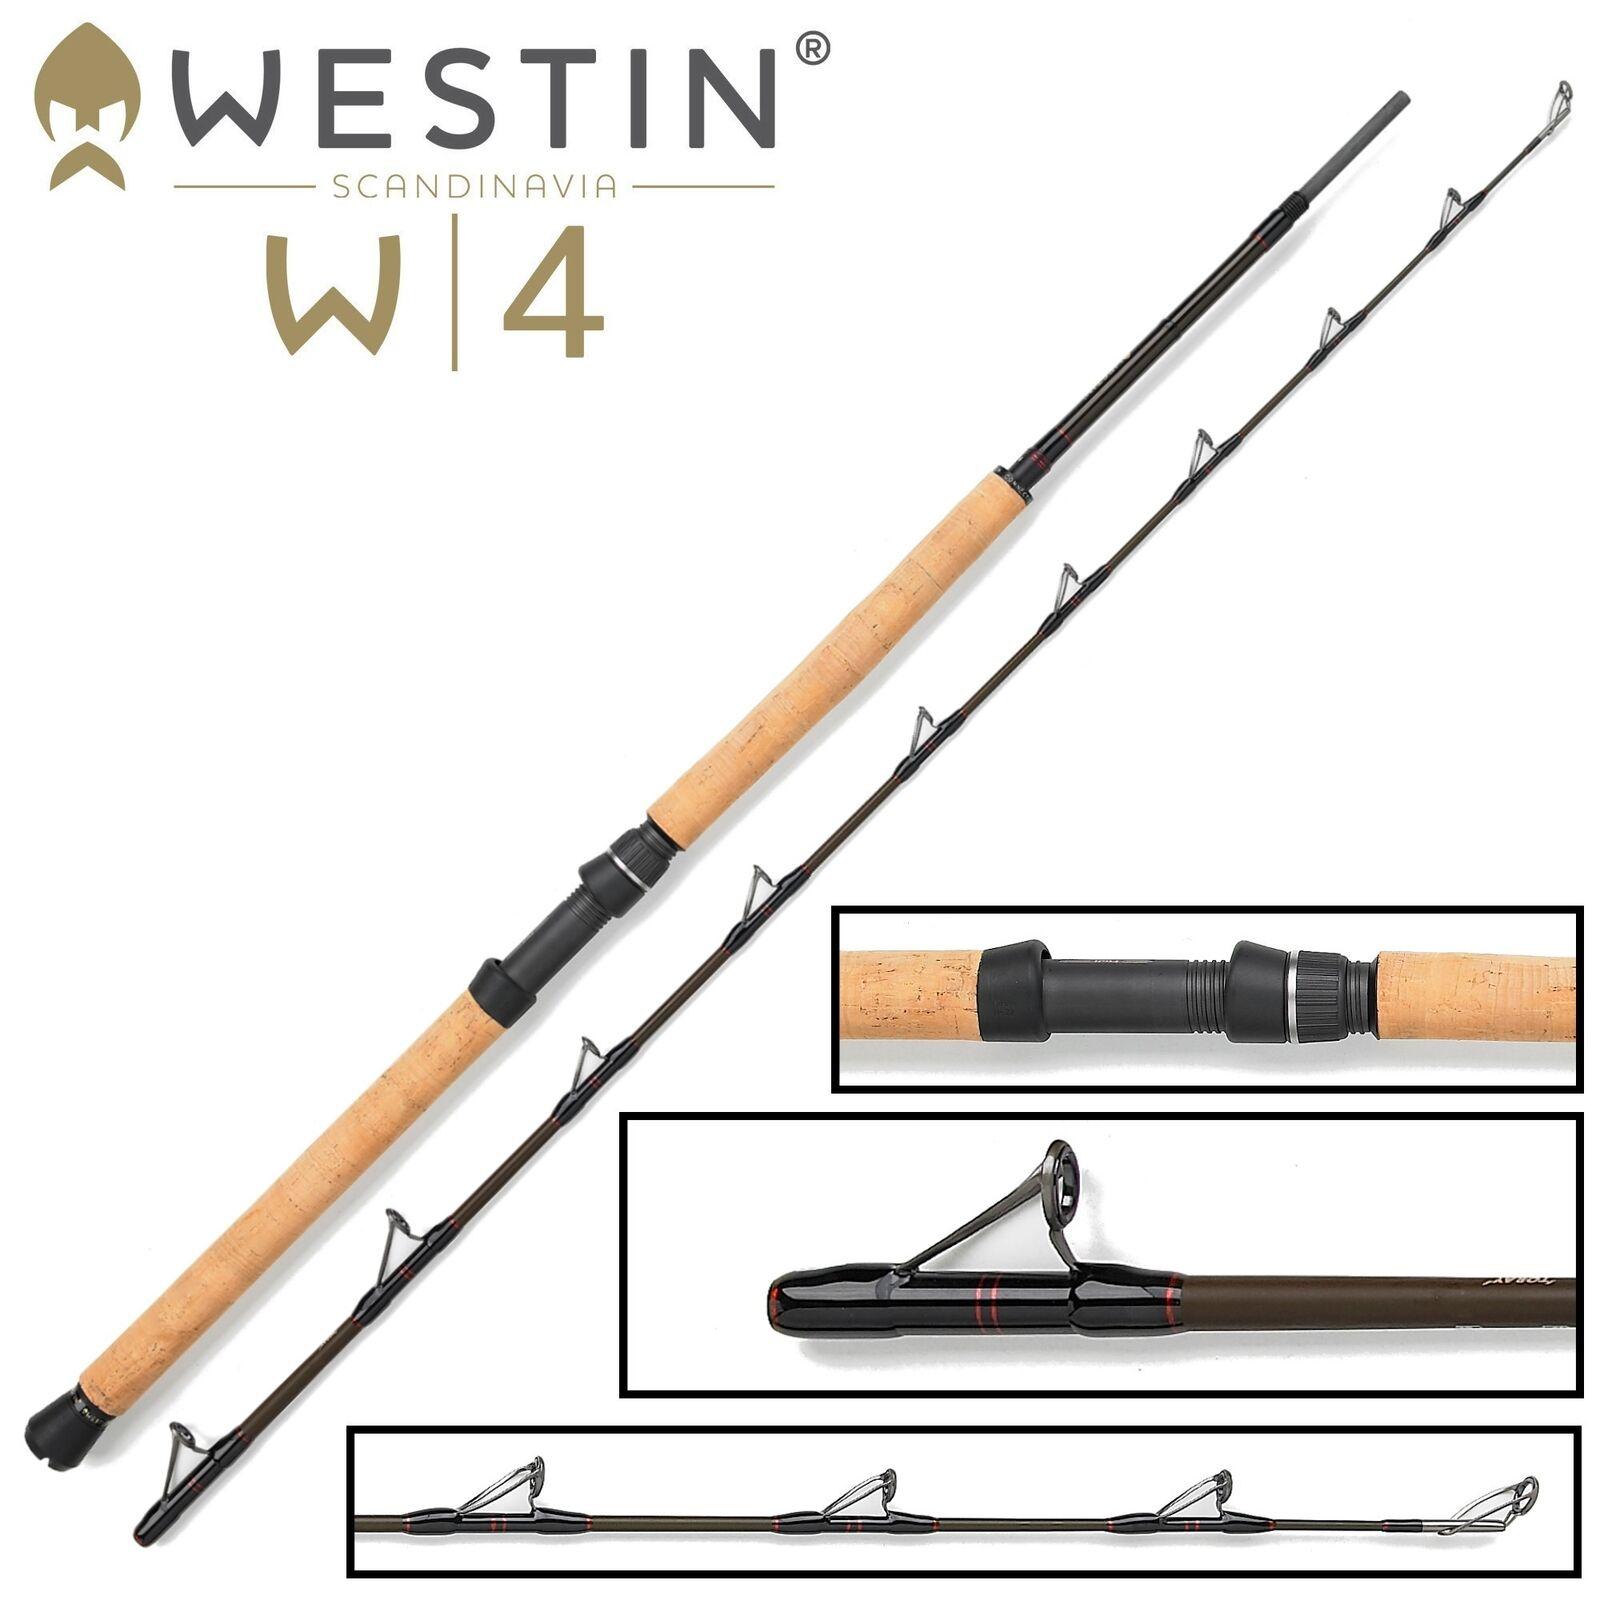 Westin W4 Boat XH 195cm 20-30lbs 150-400g - Stiefelrute, Meeresrute, Pilkrute